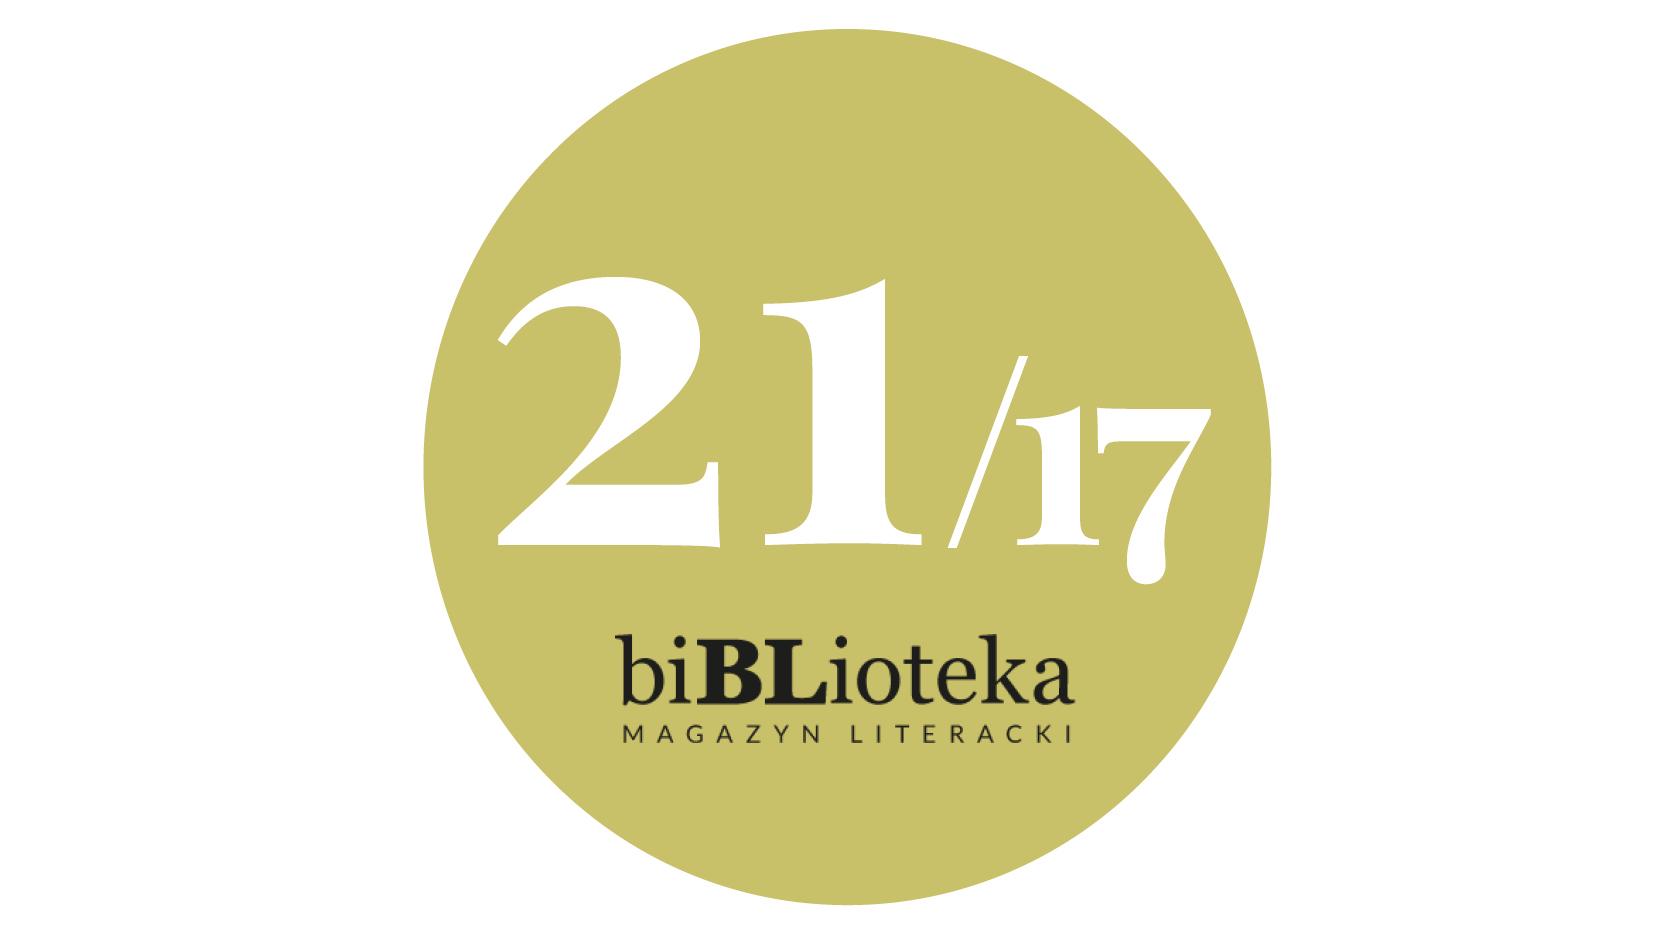 BL Img 2017.10.25 biBLioteka nr 201721_www_top